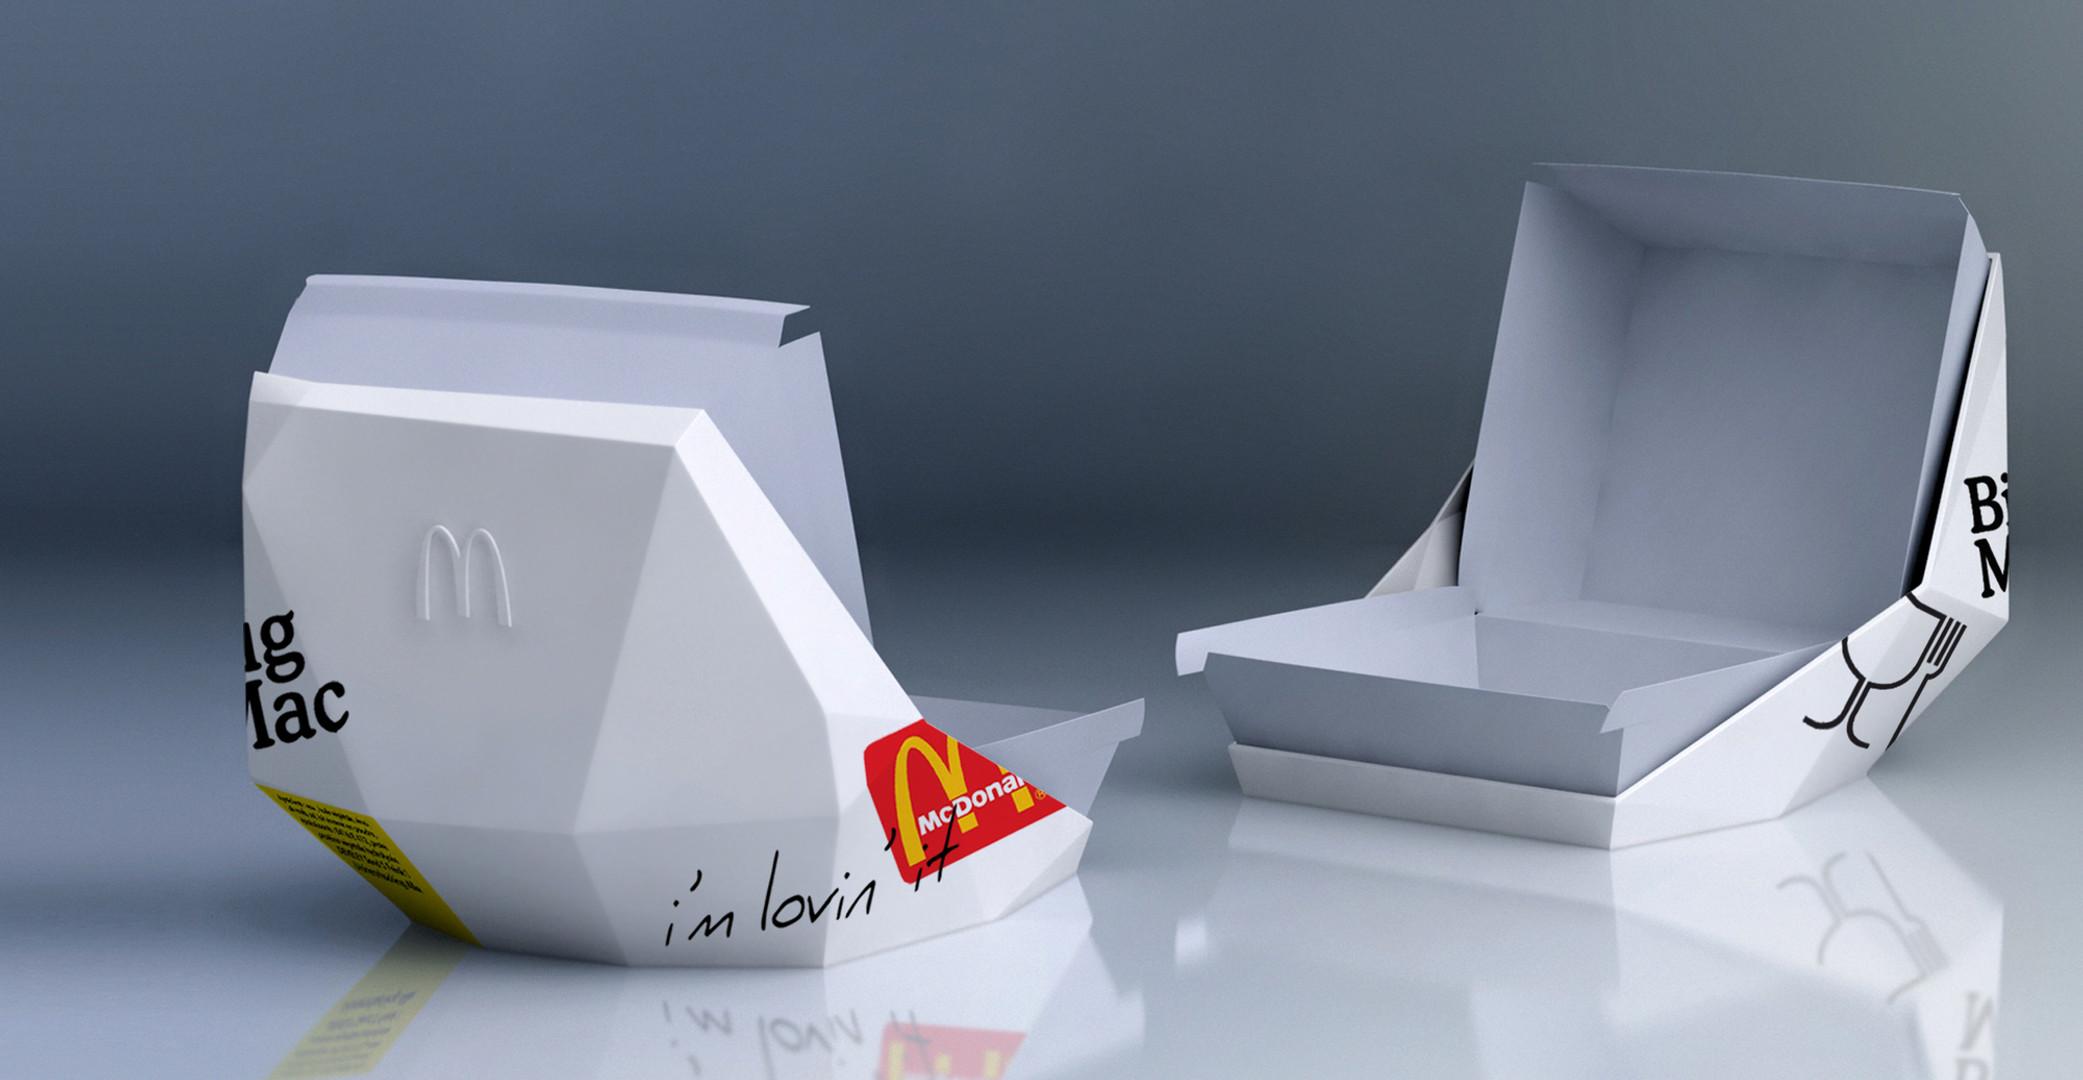 surpack-hamburger-dlt-titre-only.jpg